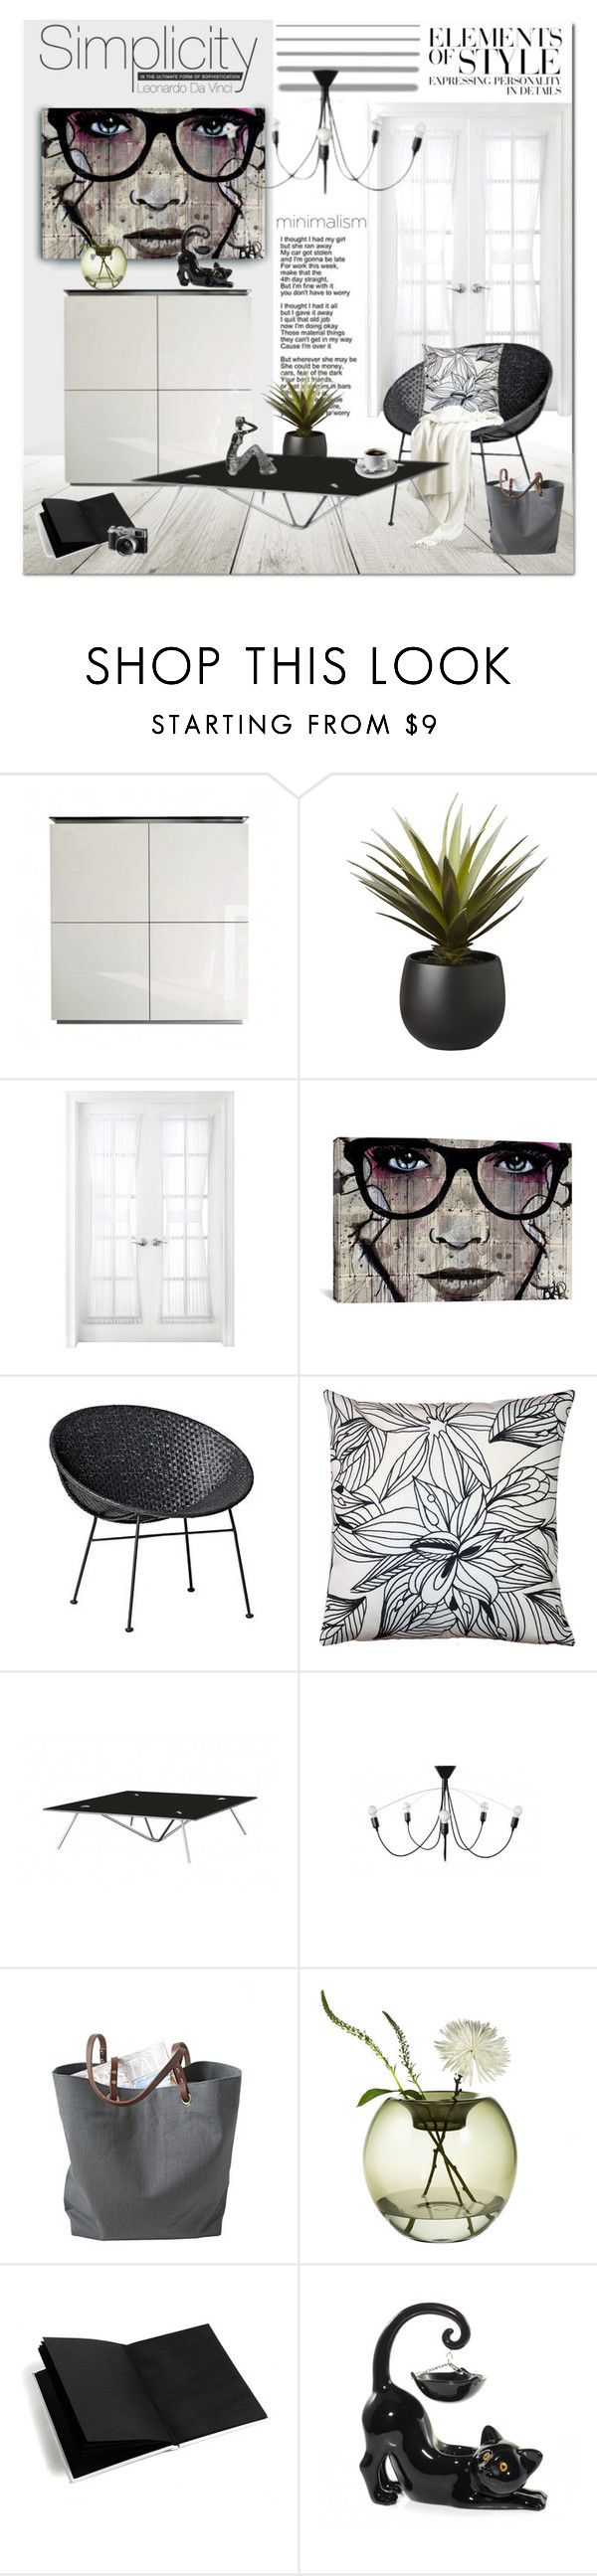 2458 best interior design images on pinterest home living room